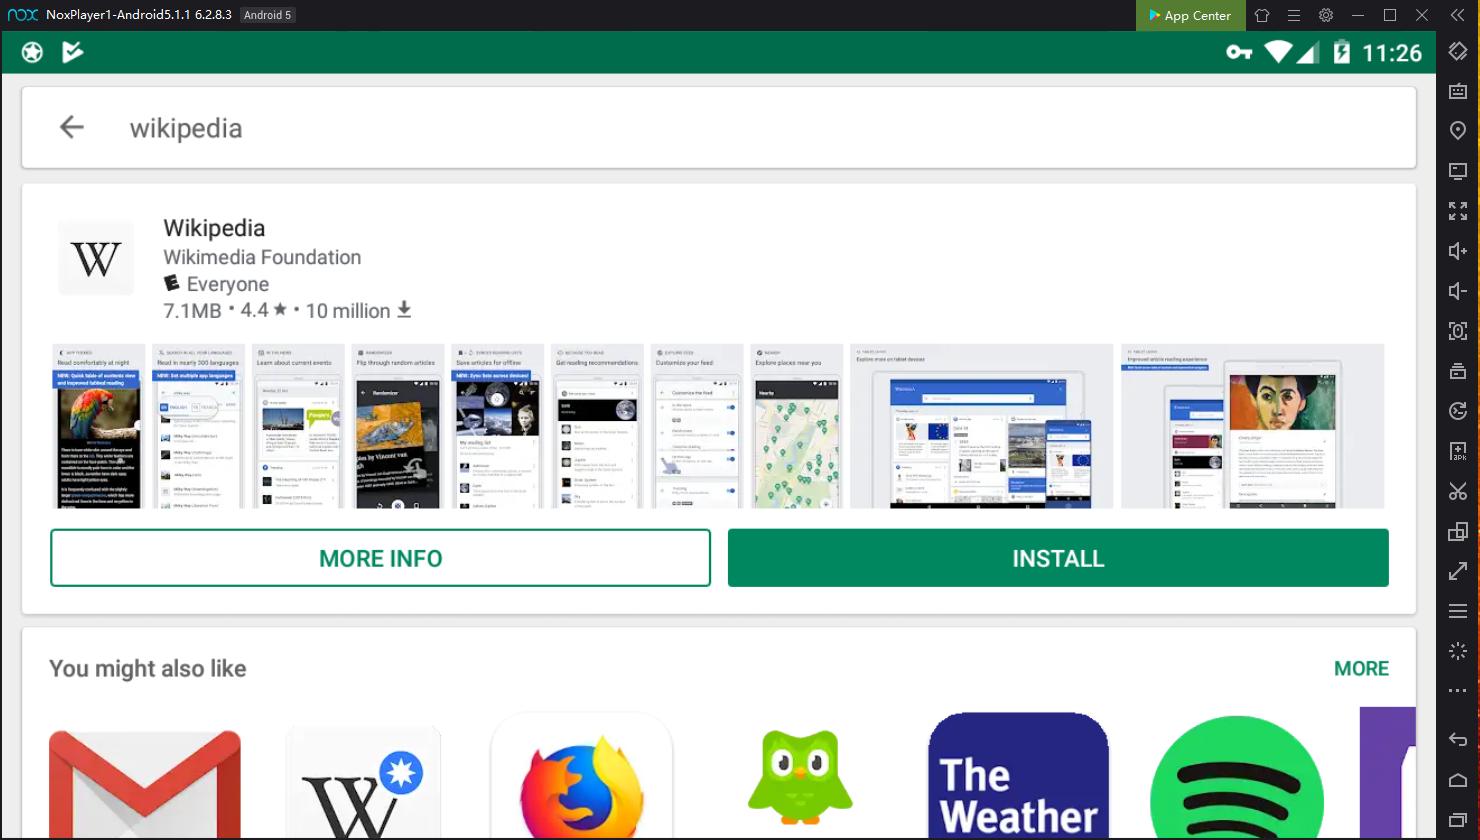 google play store installer v6.0.5.apk